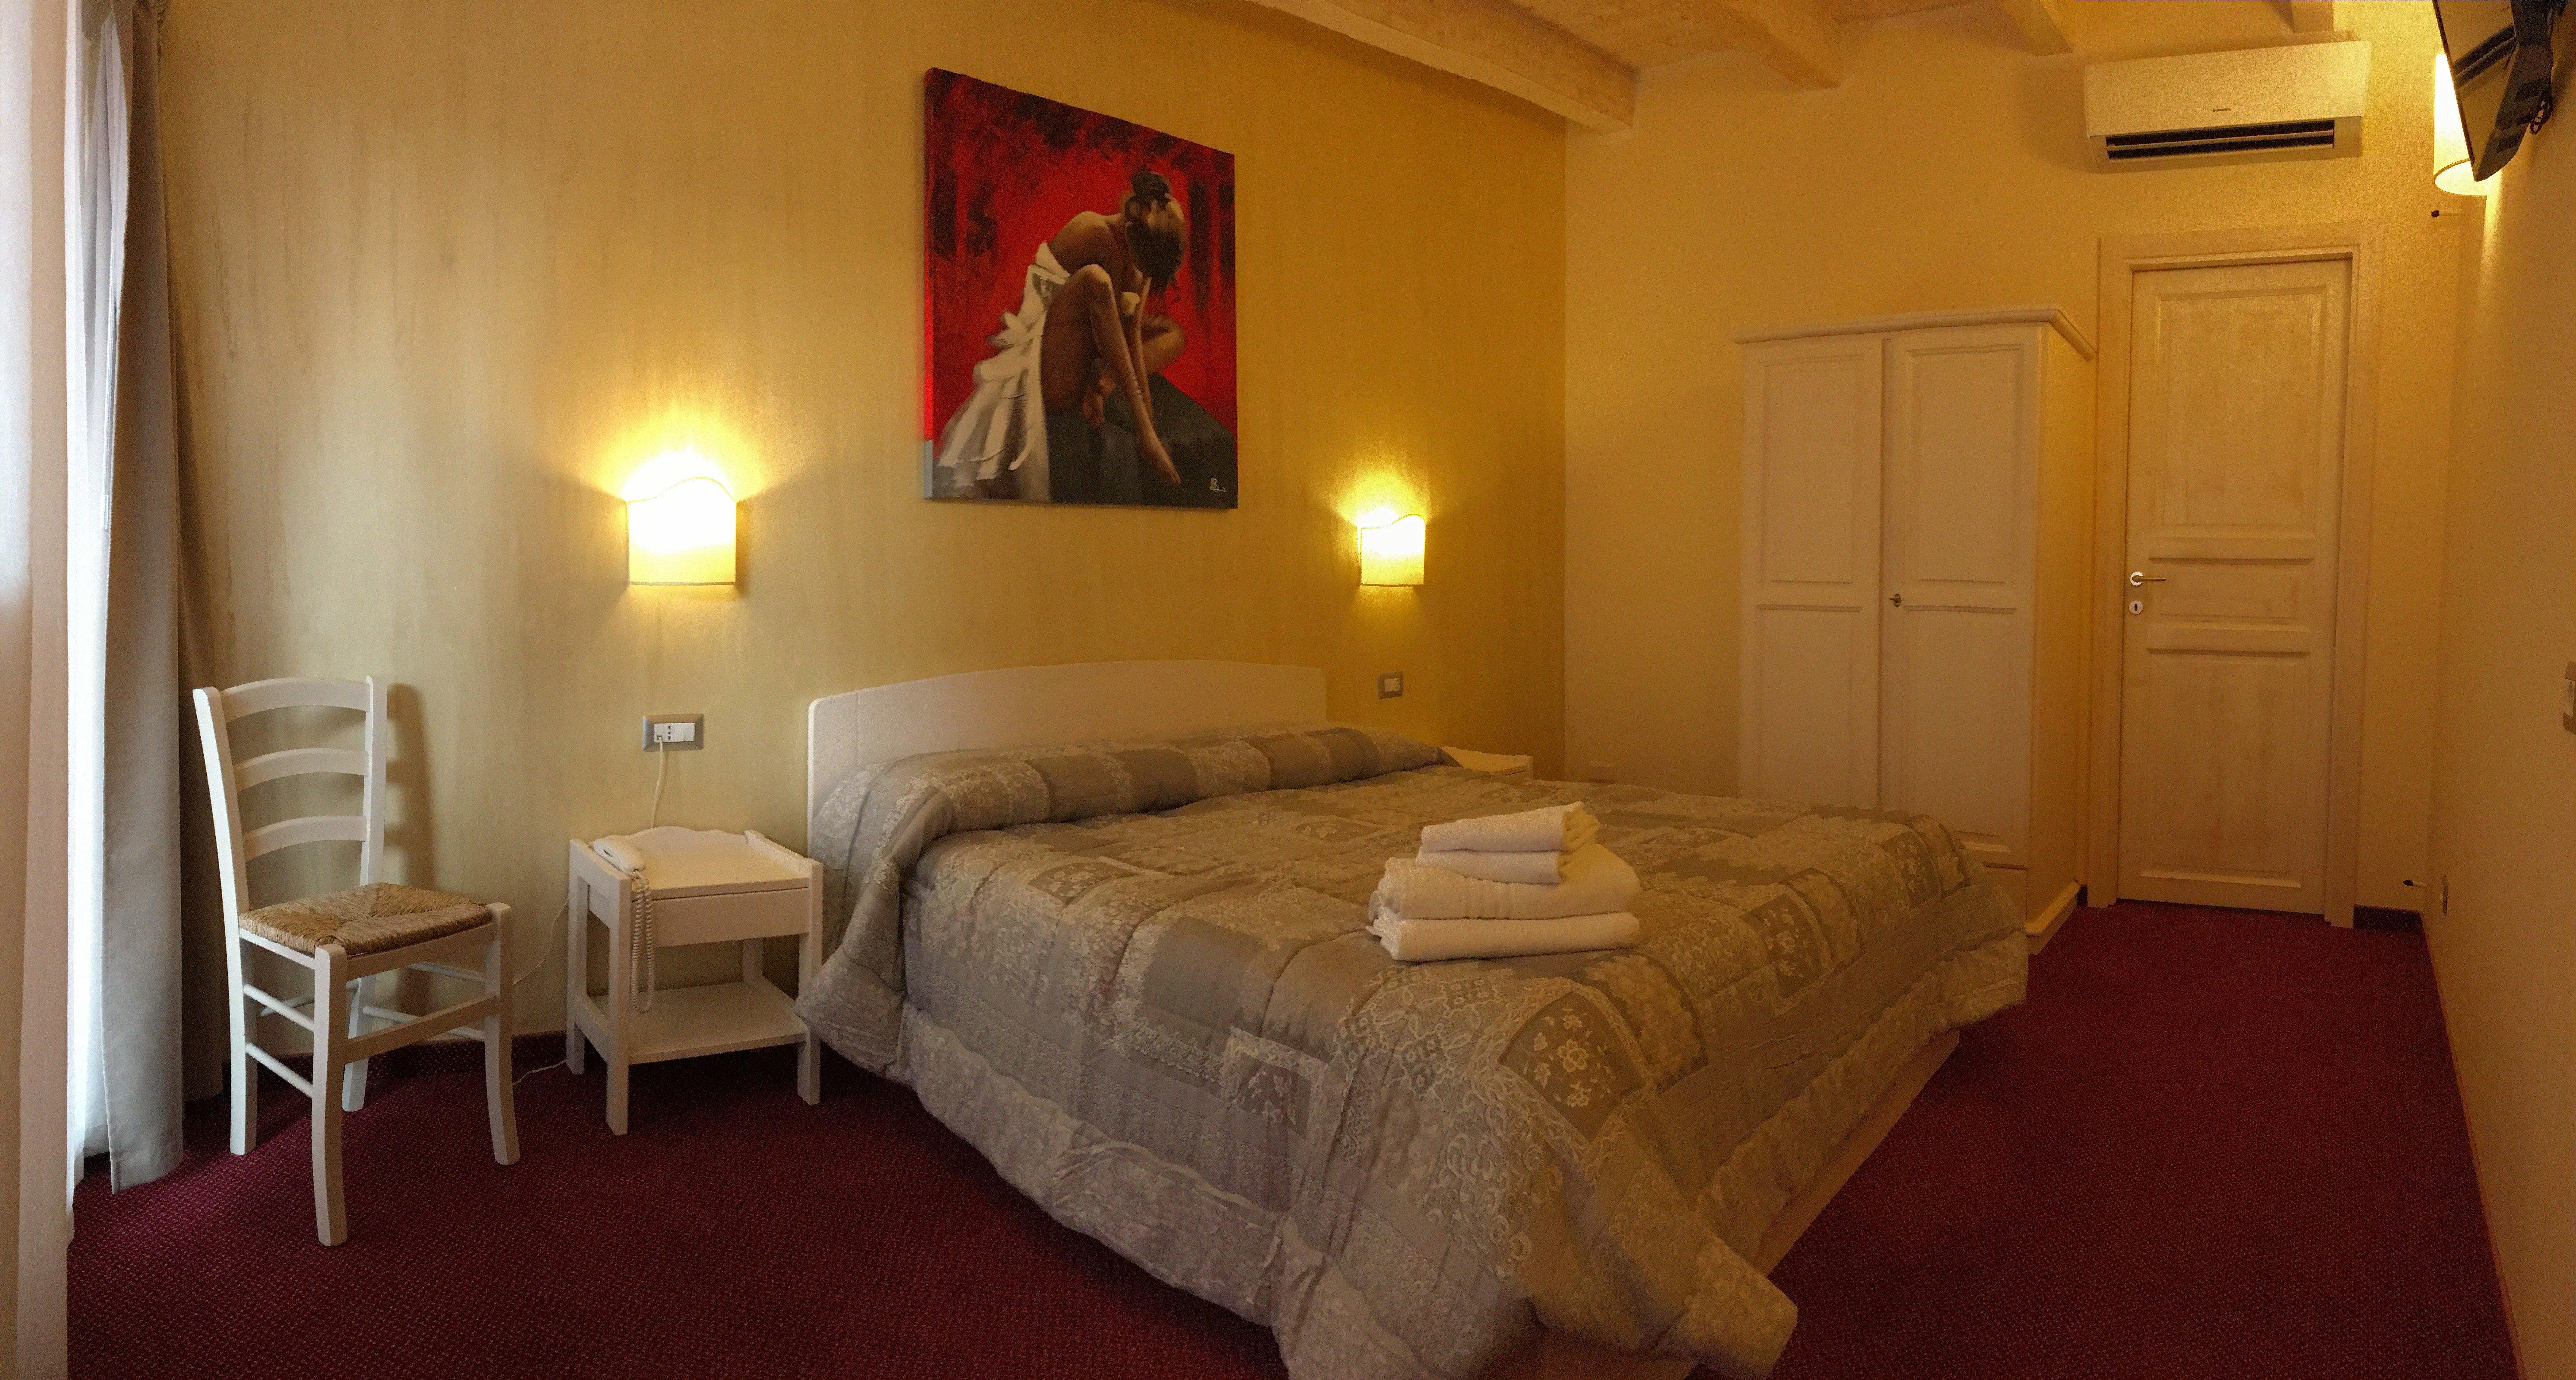 BED & BREAKFAST BEL SOLE Civitavecchia (RM)